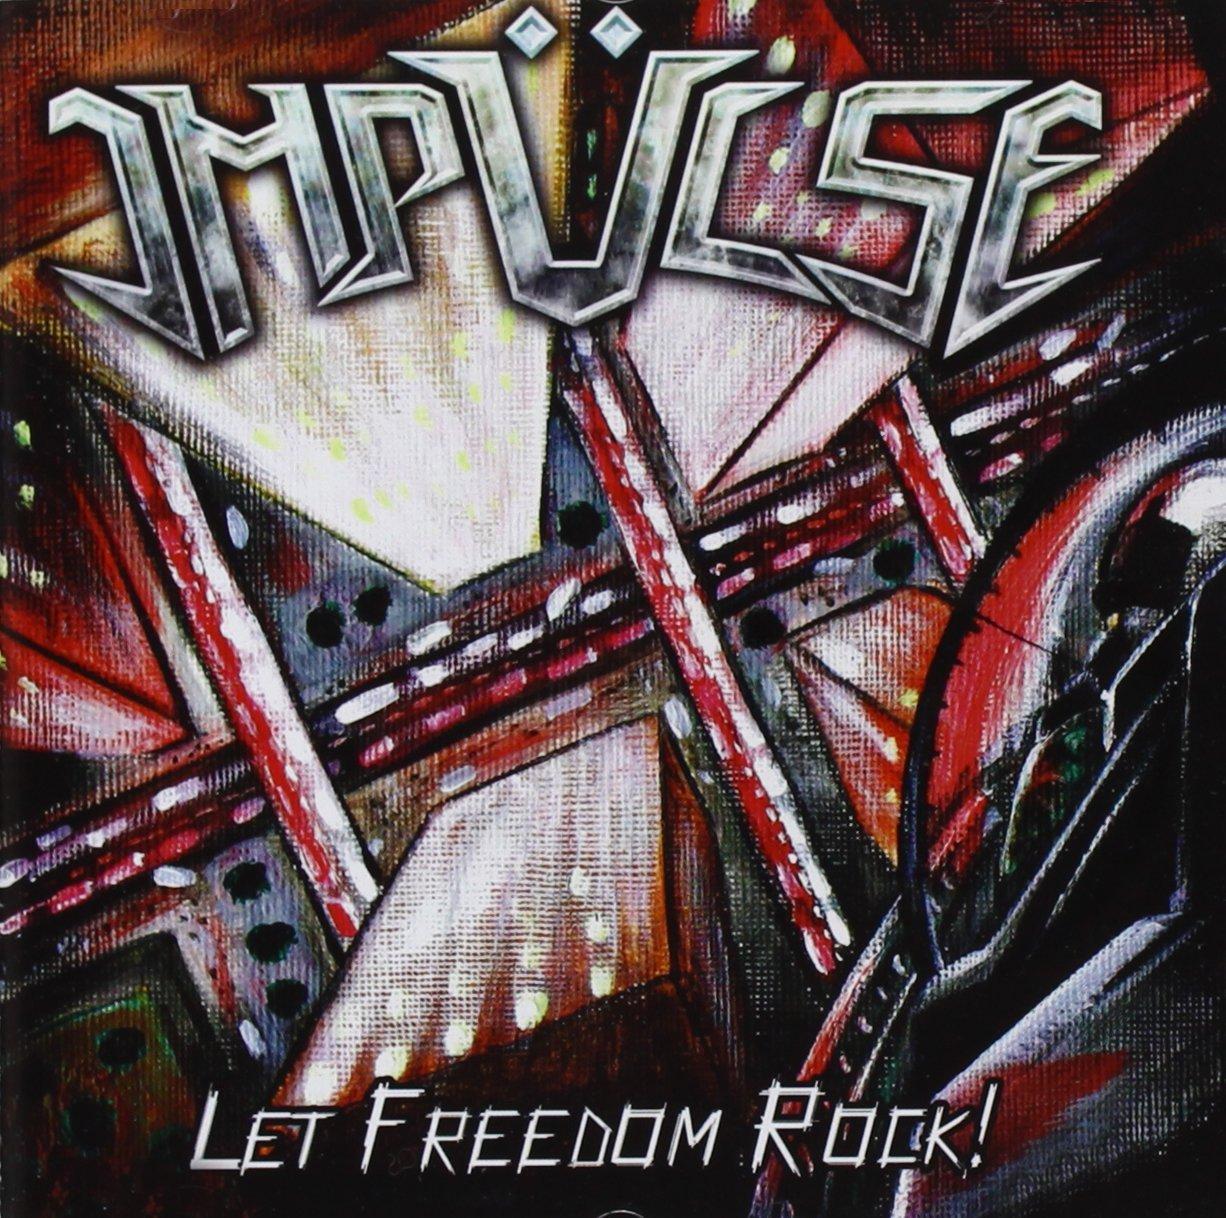 Impulse- Let Freedom Rock